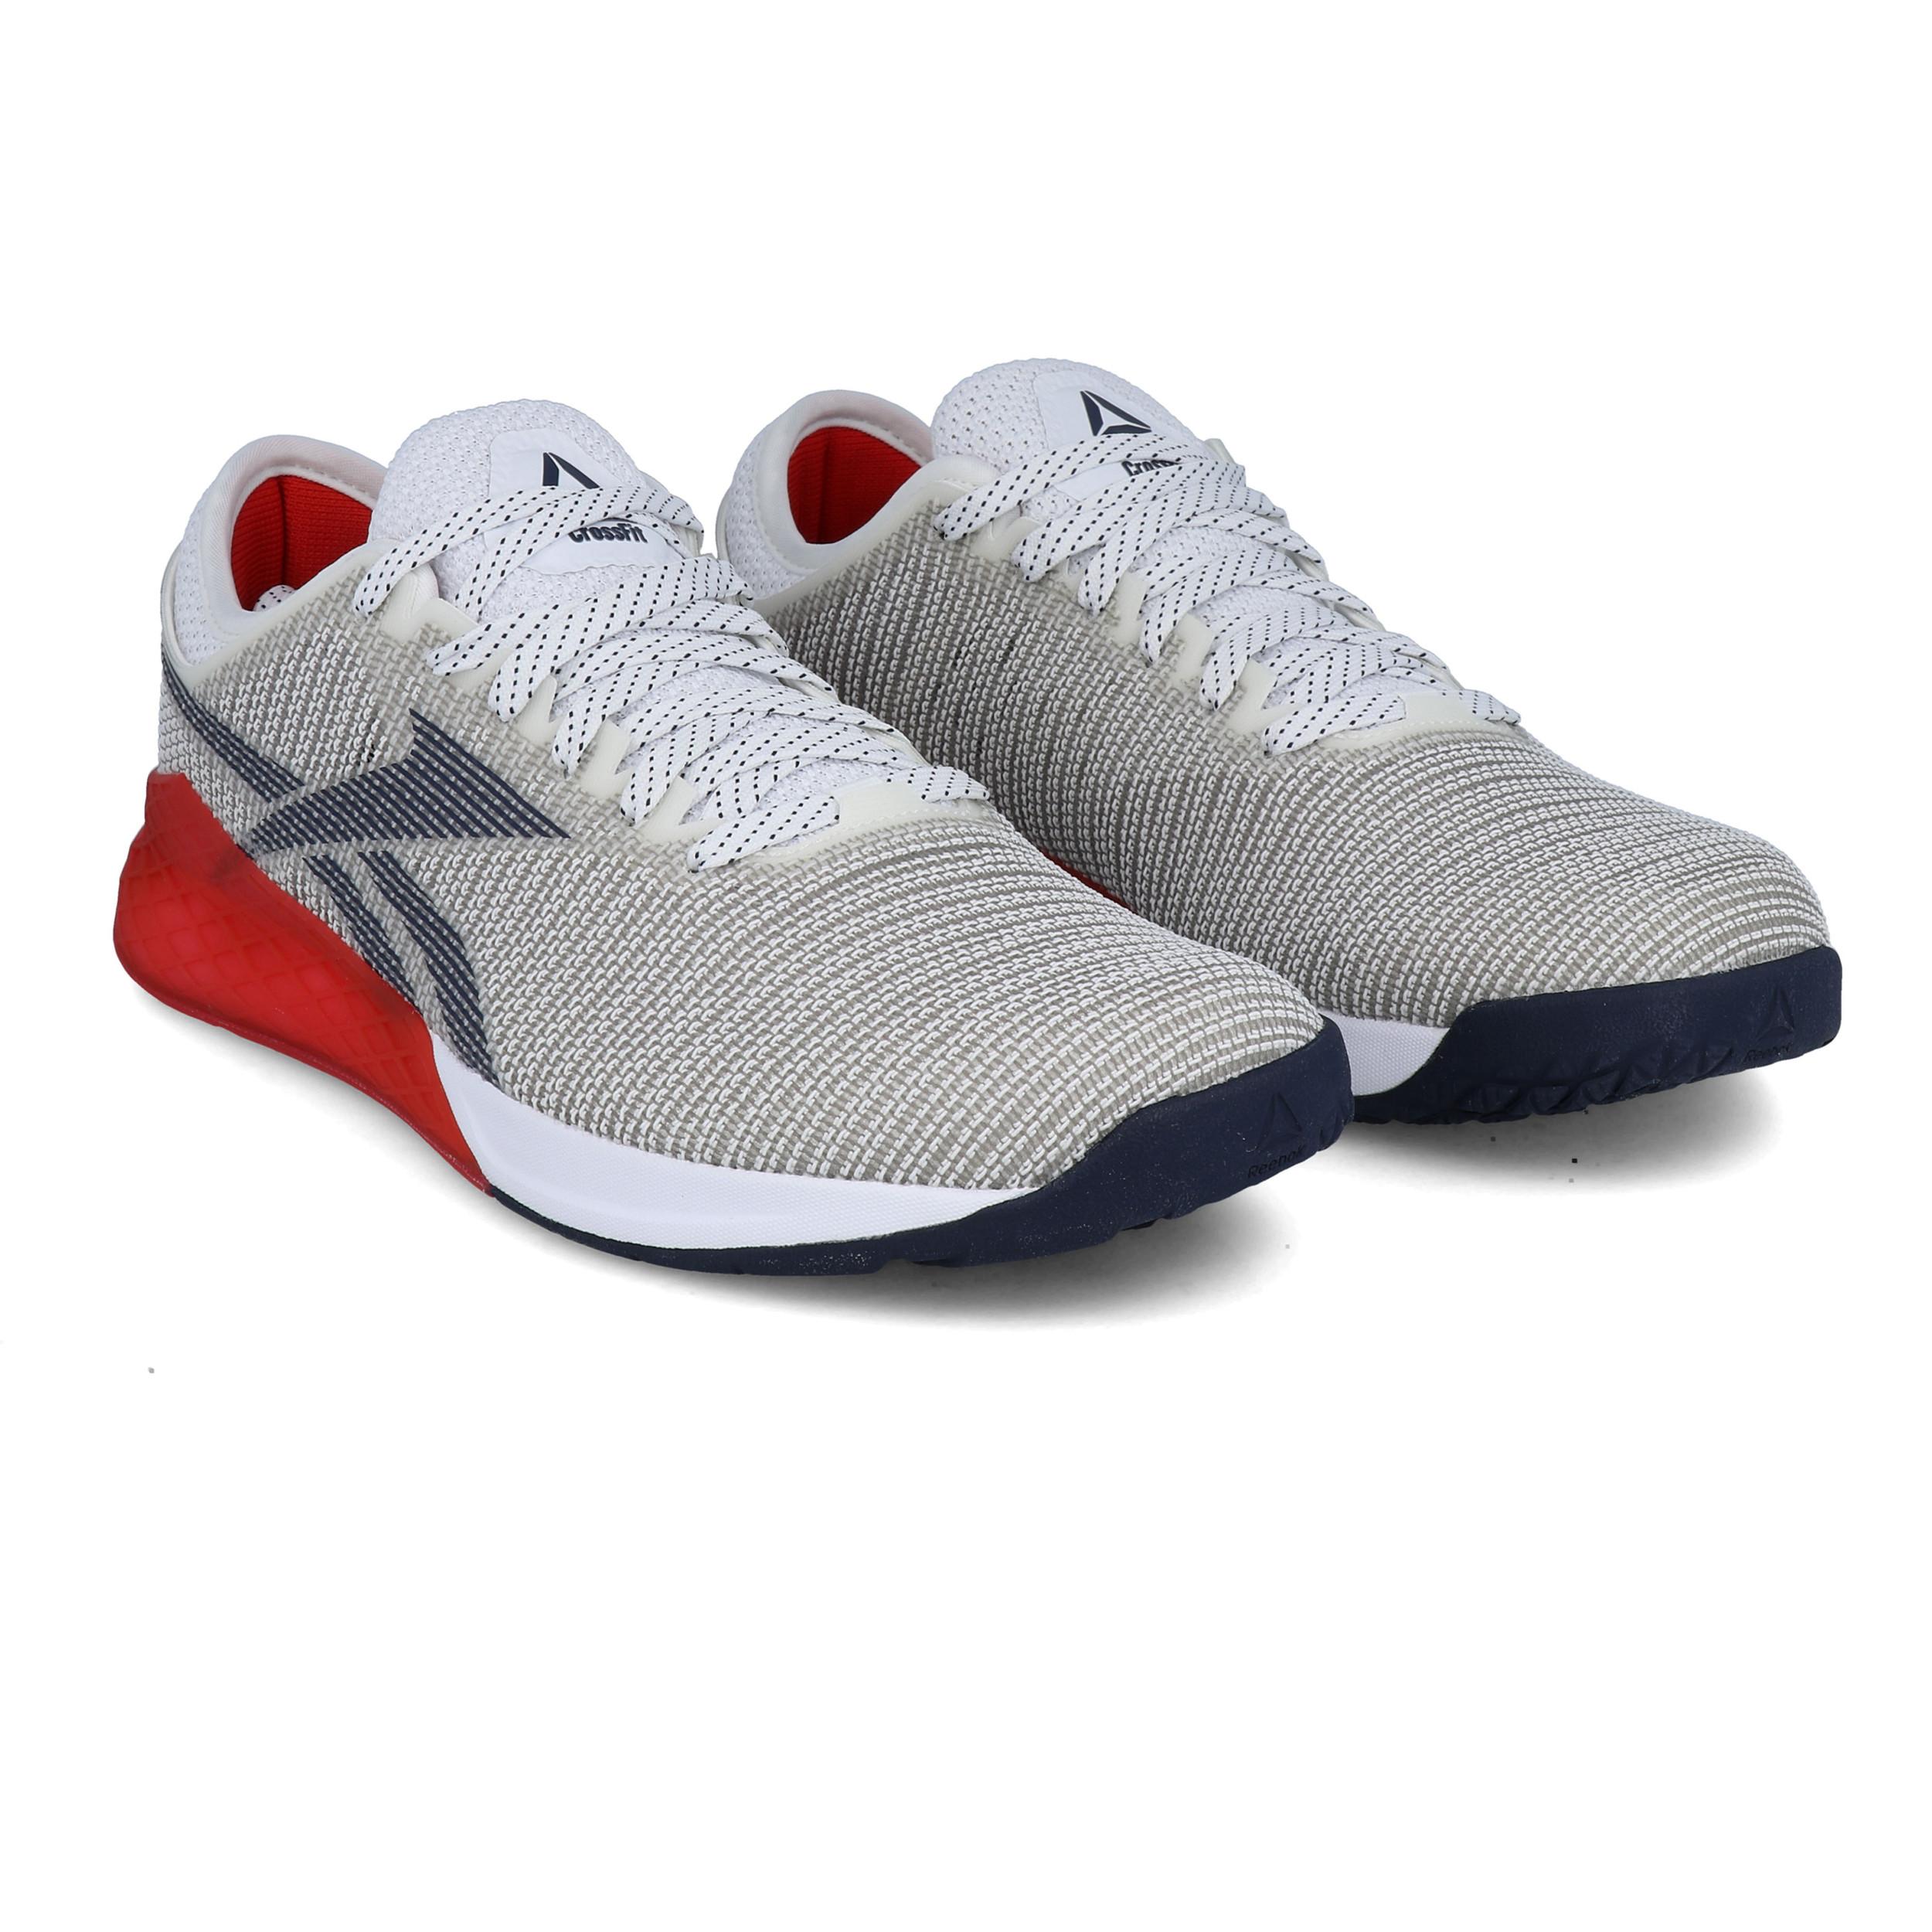 Details zu Reebok Herren Crossfit Nano 9 Trainingsschuhe Fitness Schuhe Sport Sneaker Rot